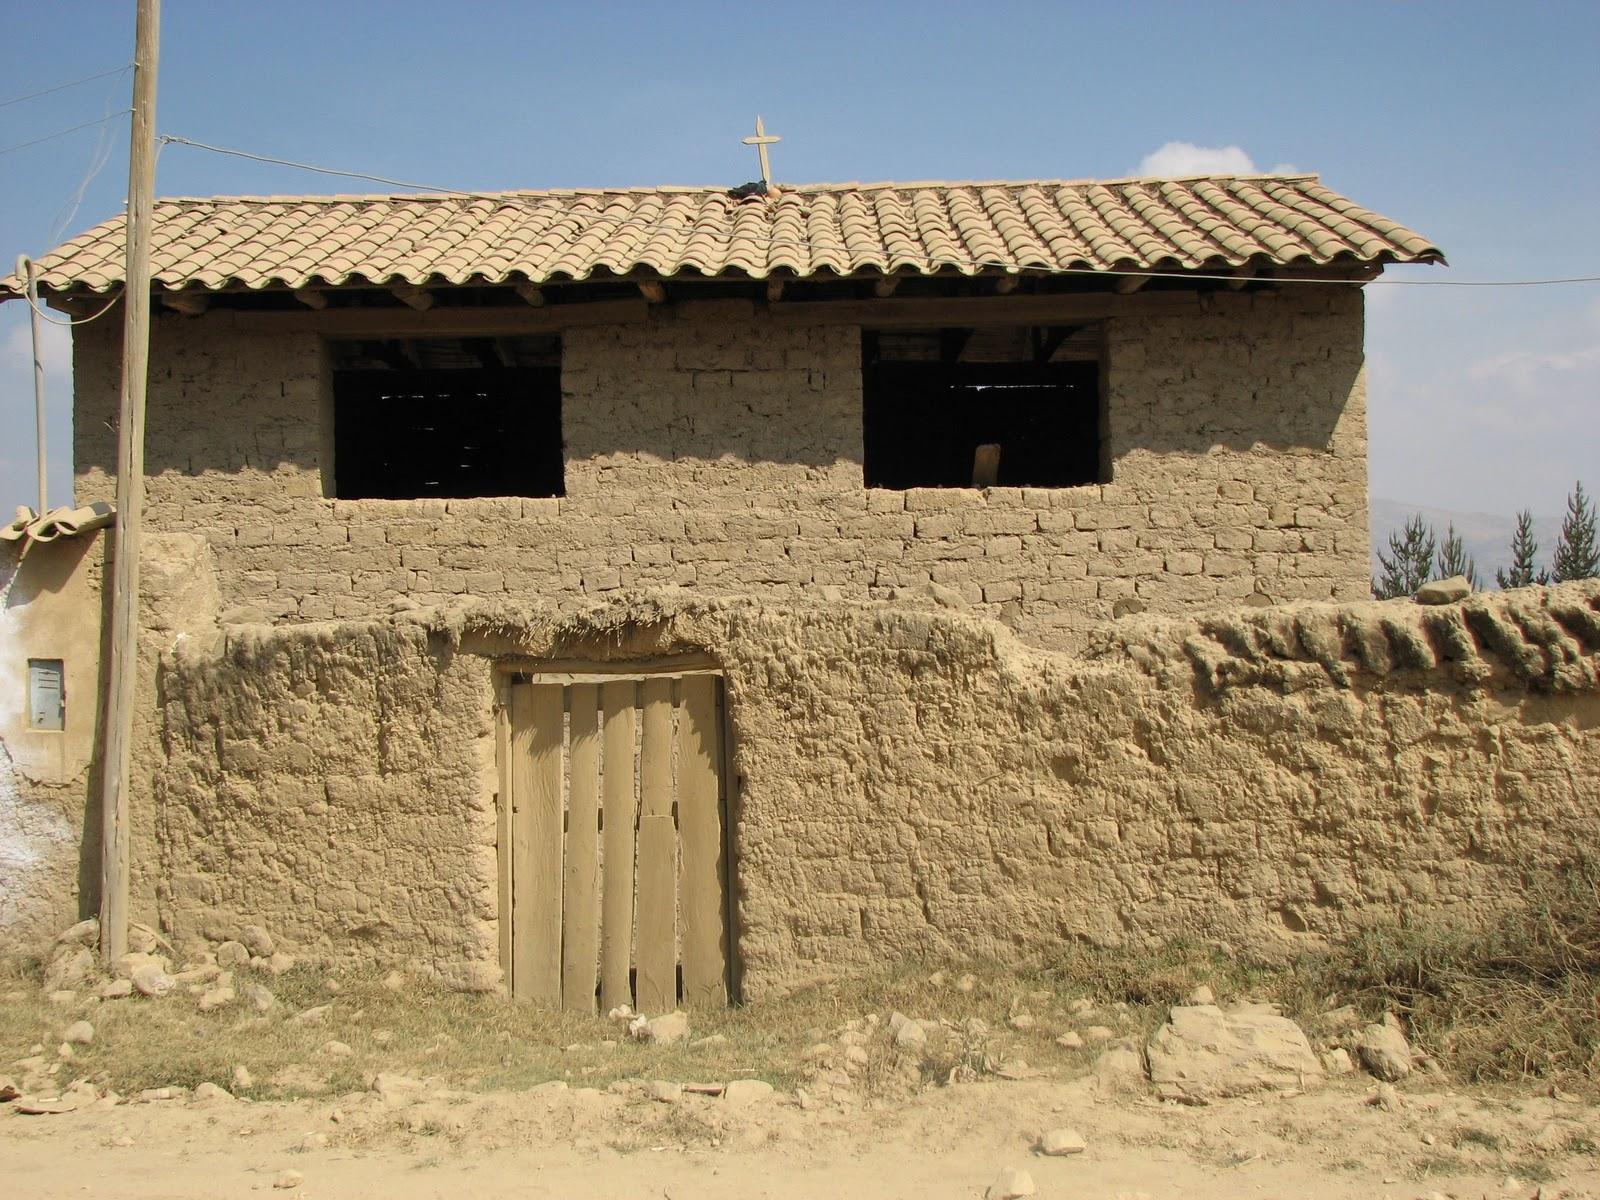 Adobe Bricks Homes Lima Peru